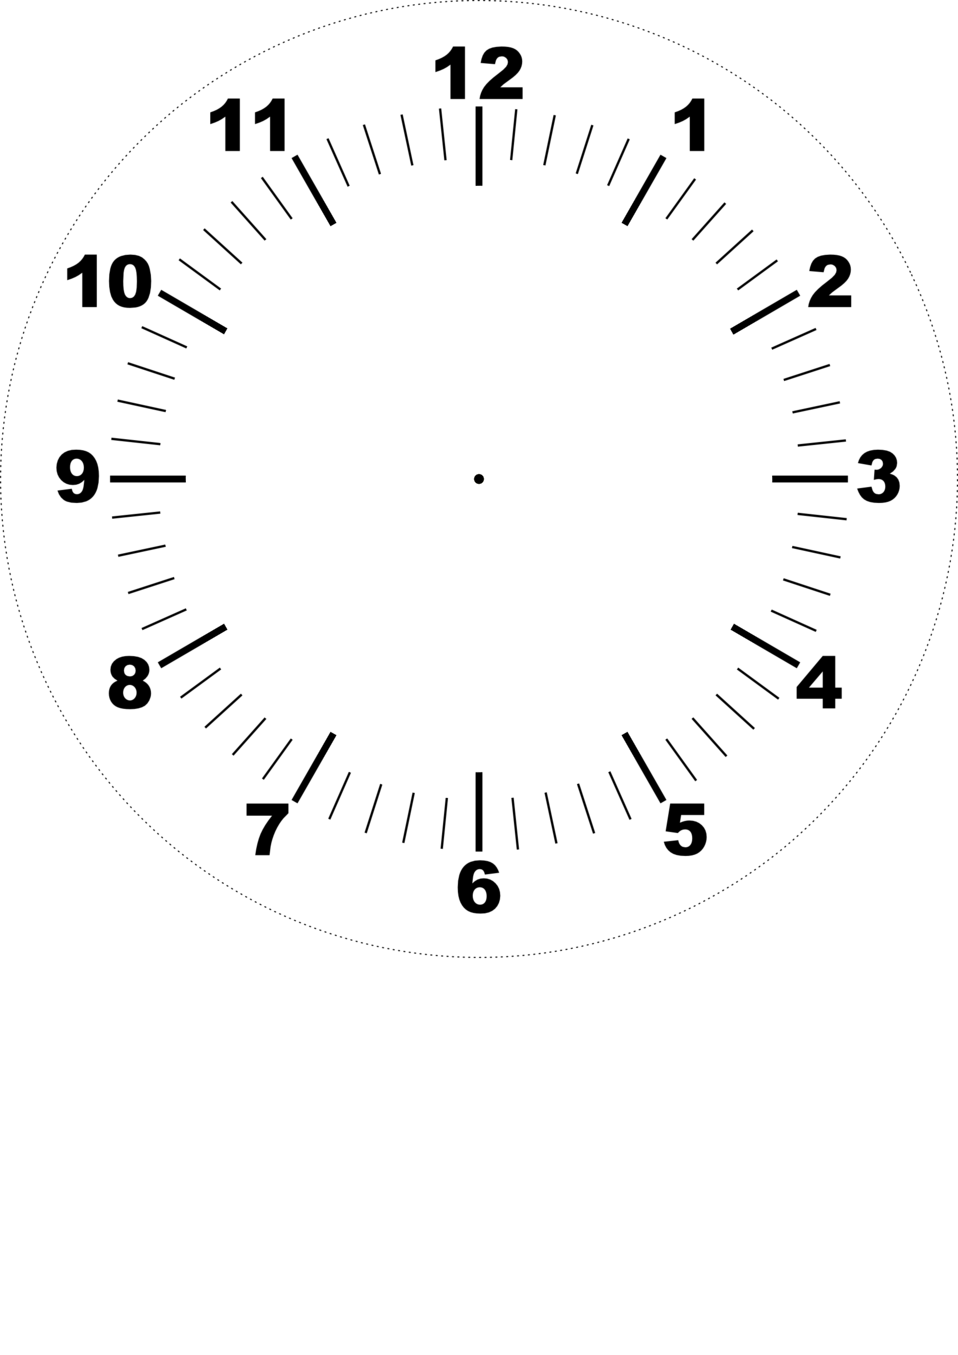 Public Domain Clip Art Image | DIY clock face | ID ...